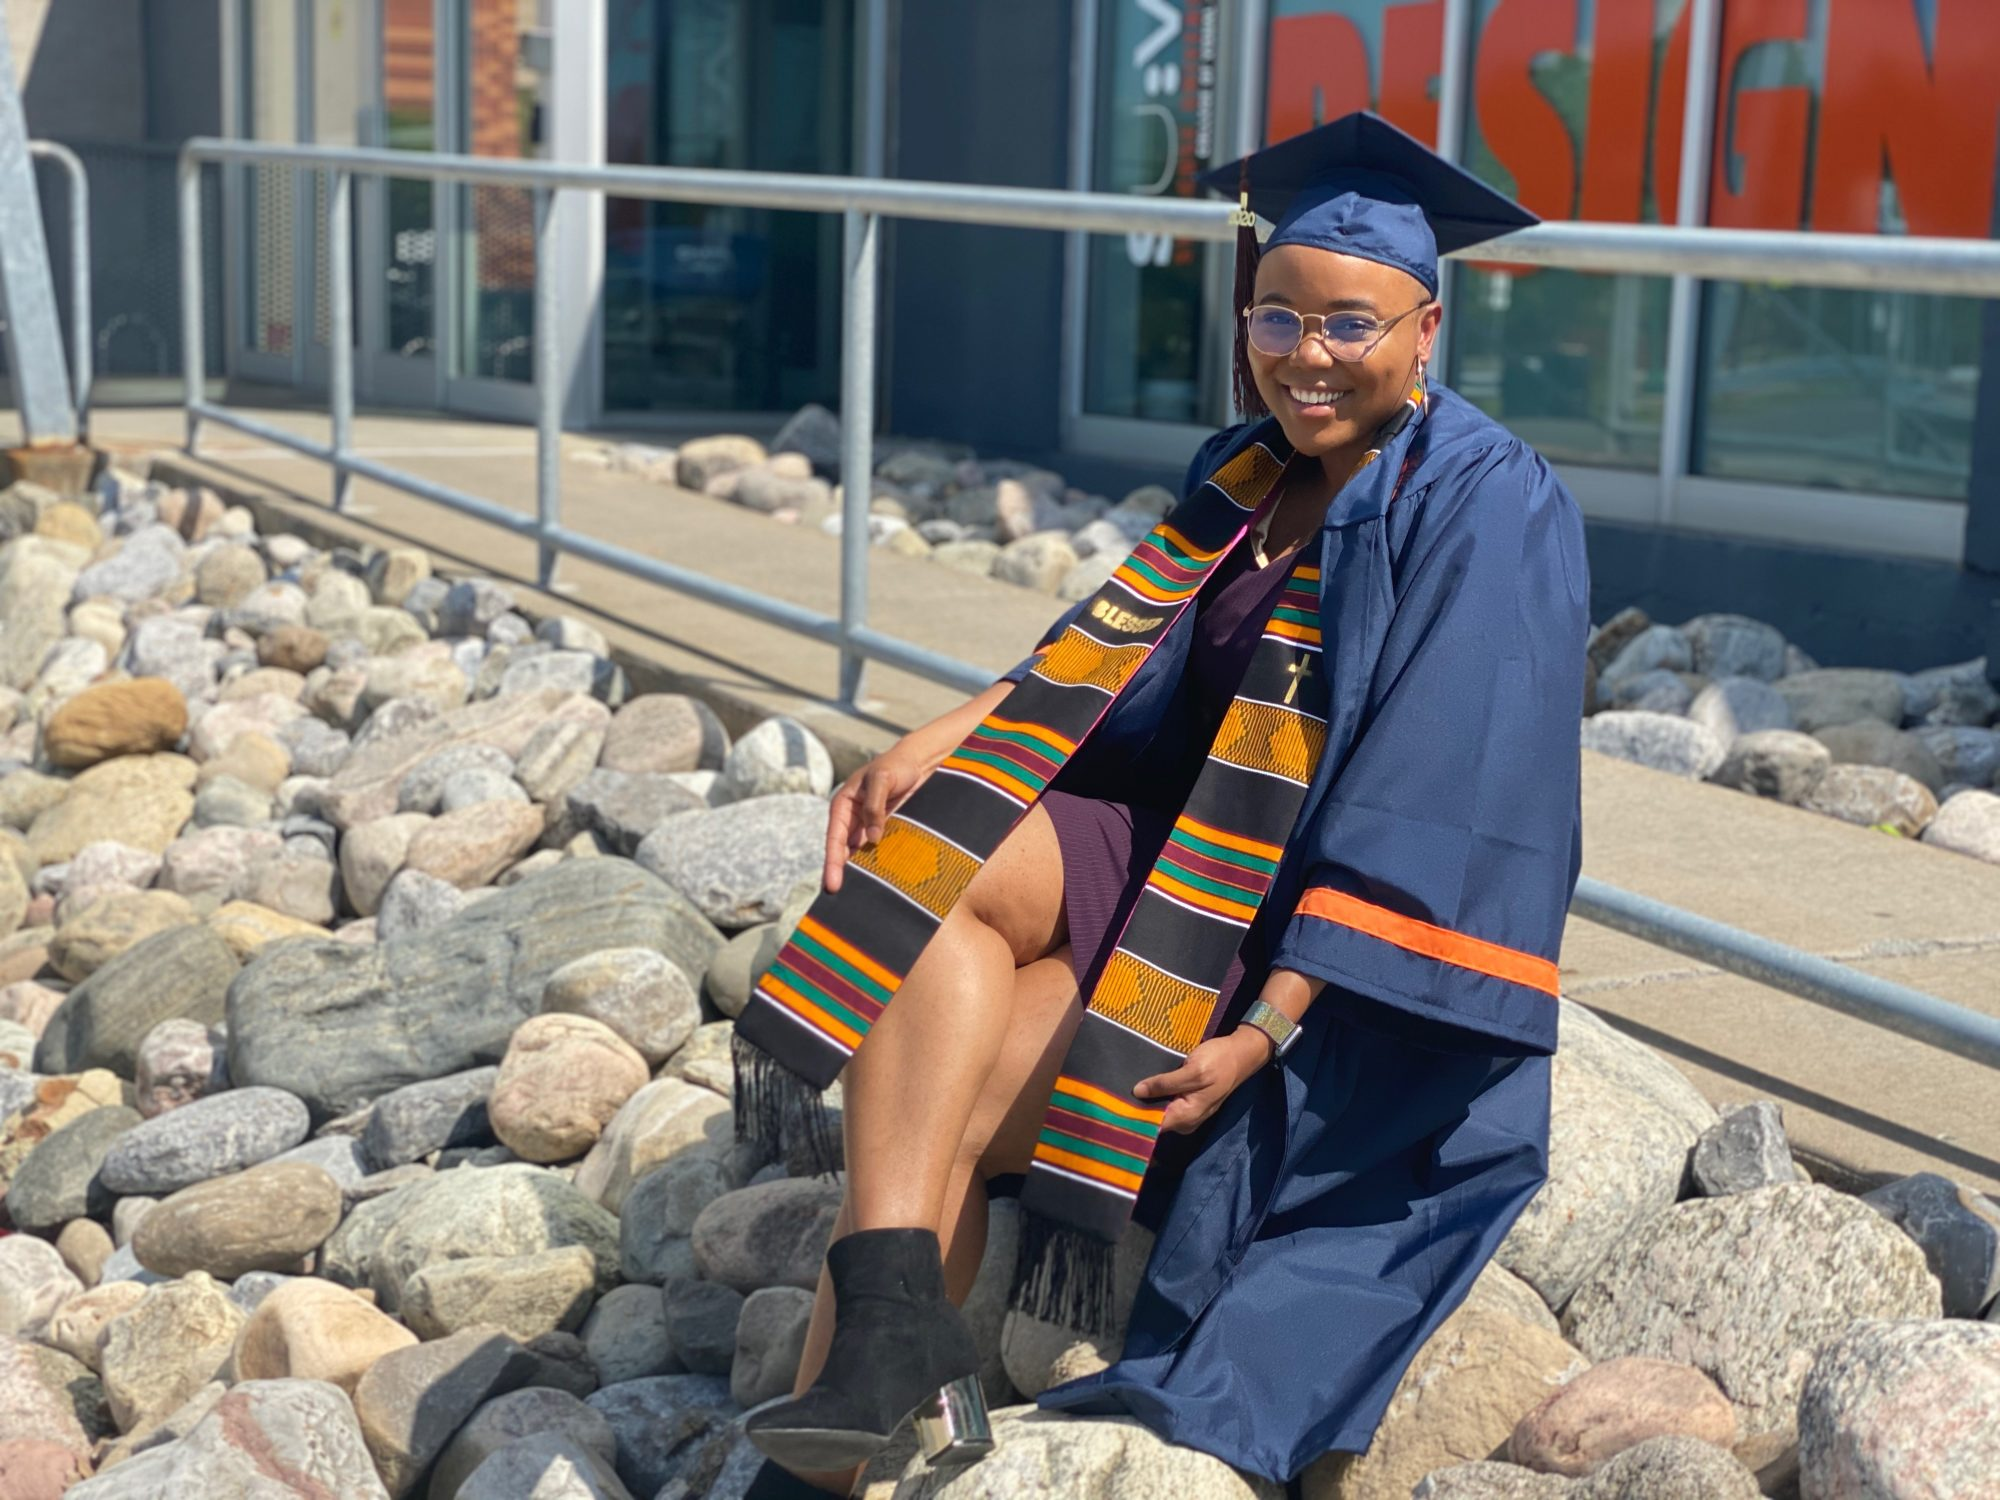 Woman in graduation regalia